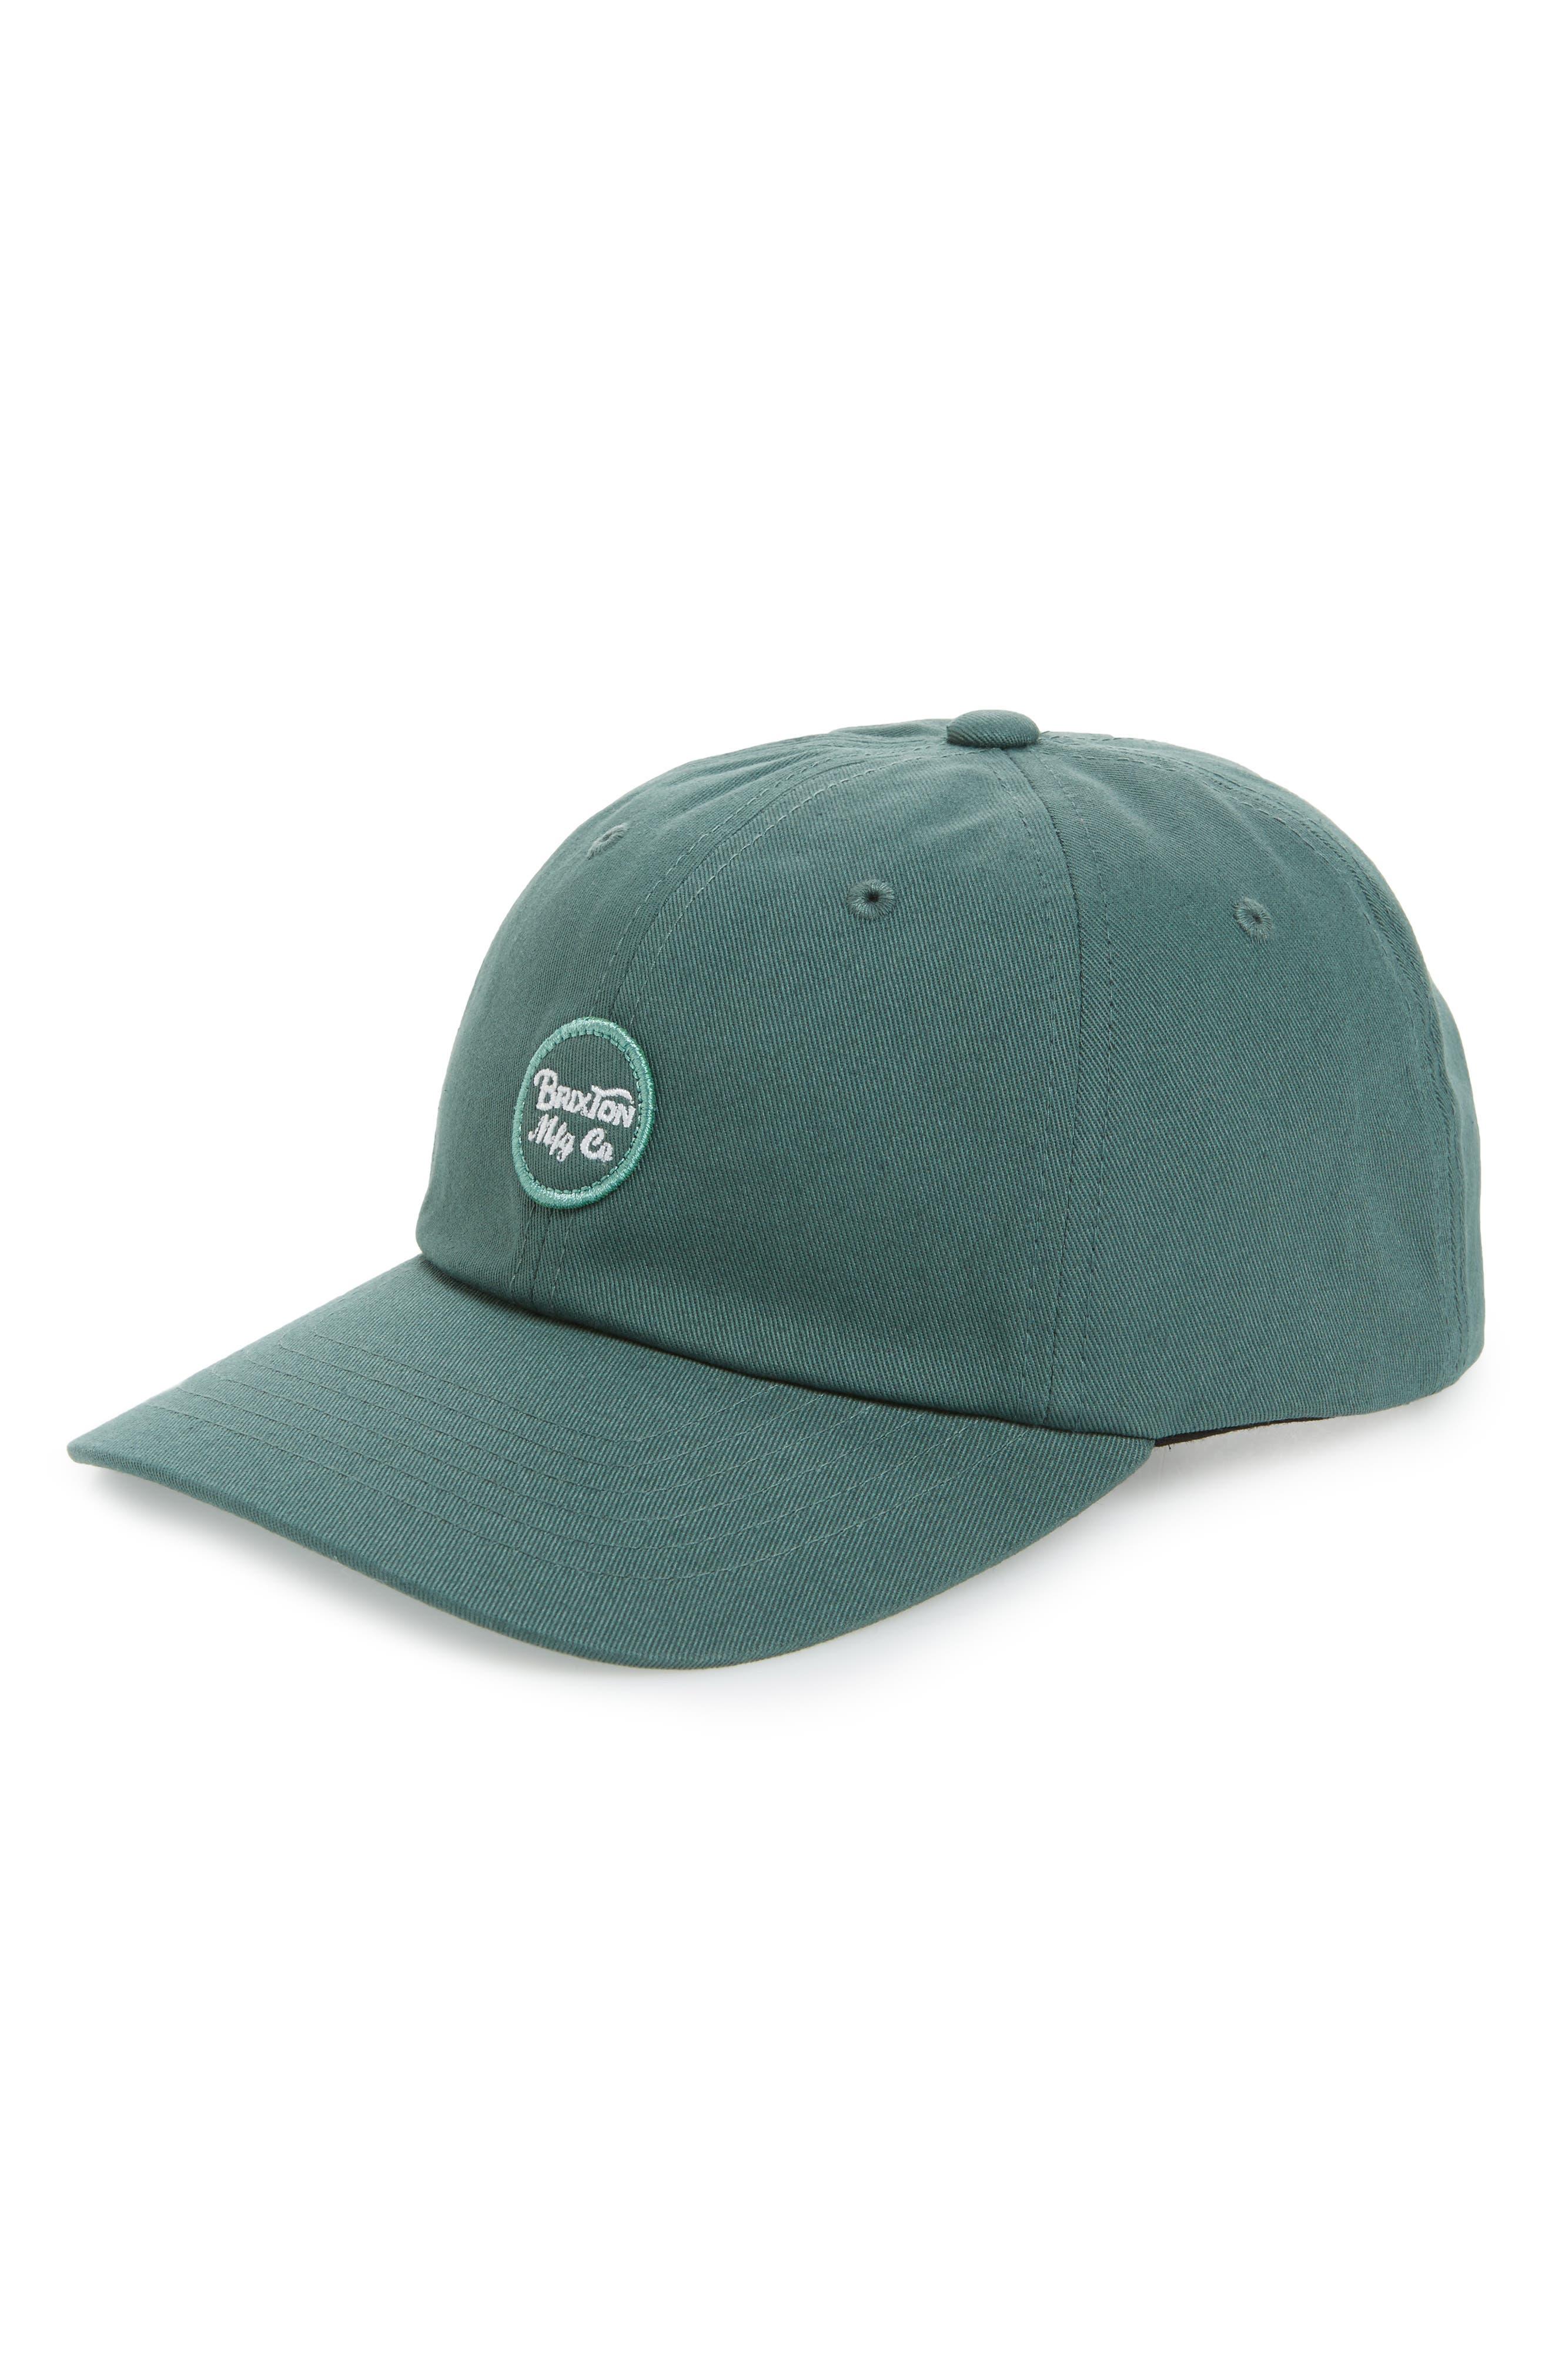 Wheeler Baseball Cap,                             Main thumbnail 1, color,                             Chive